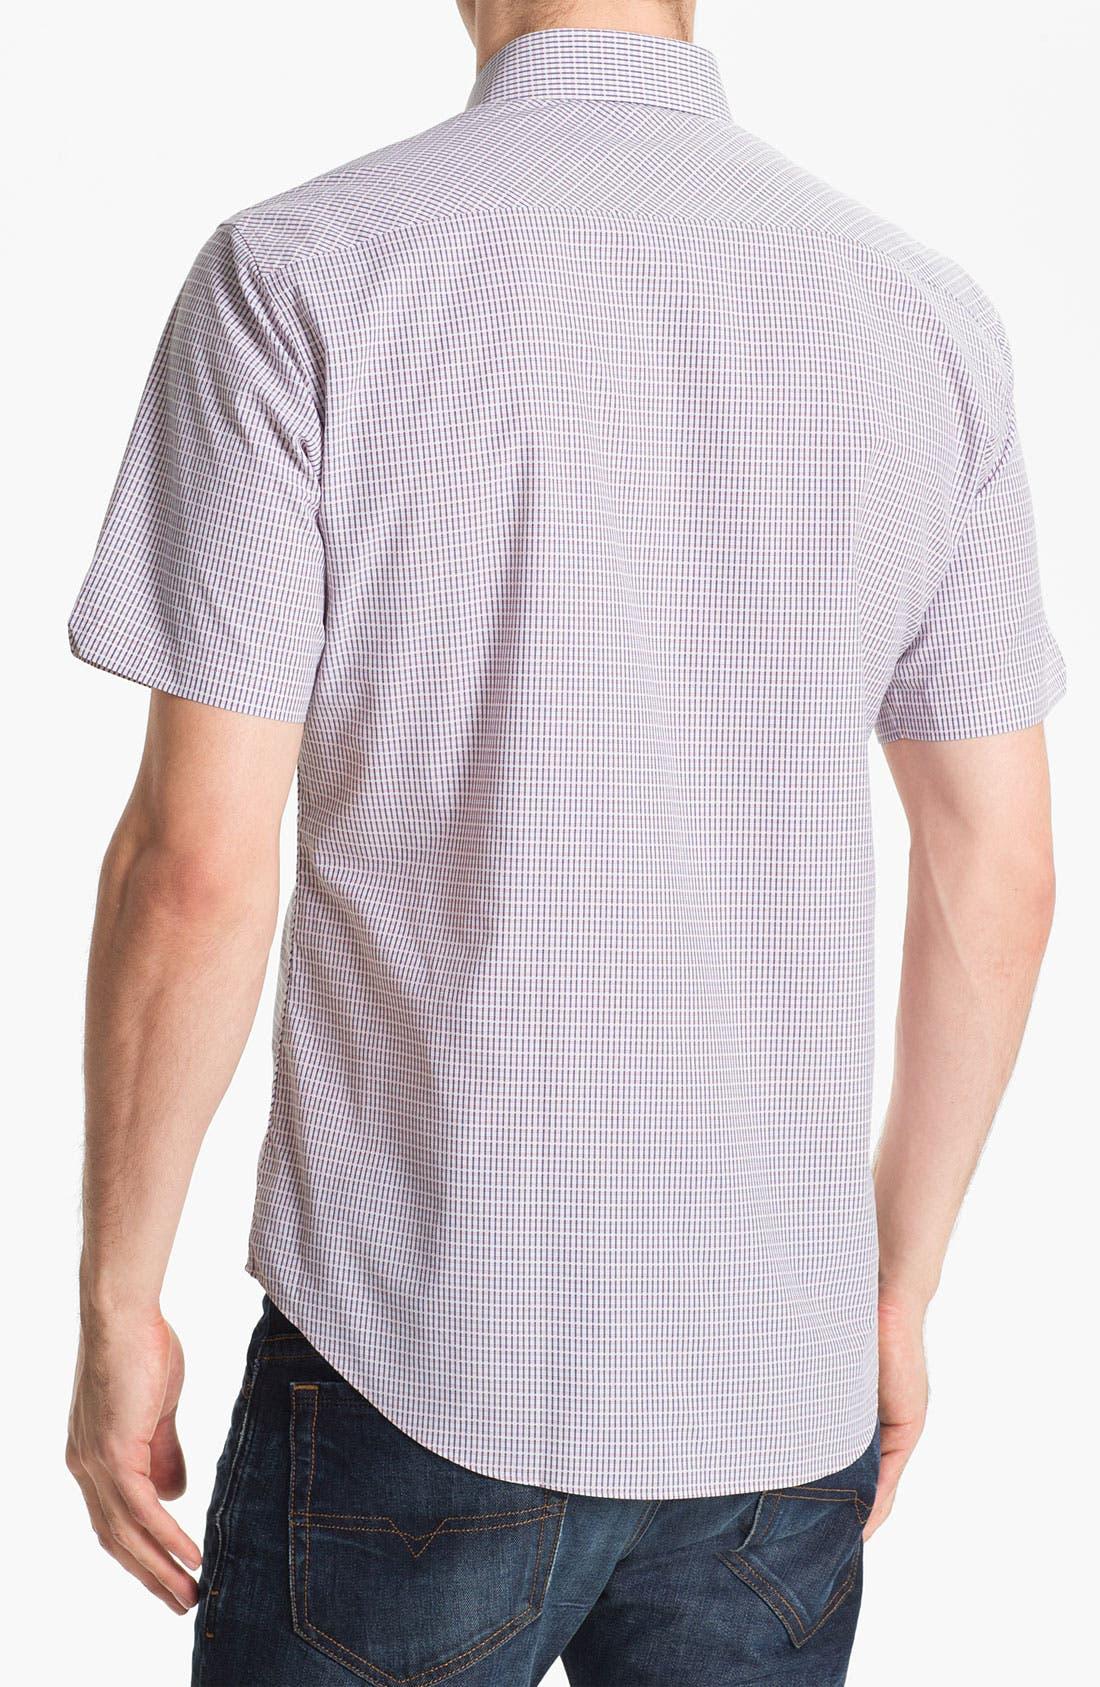 Alternate Image 2  - Zachary Prell 'Kennedy' Sport Shirt